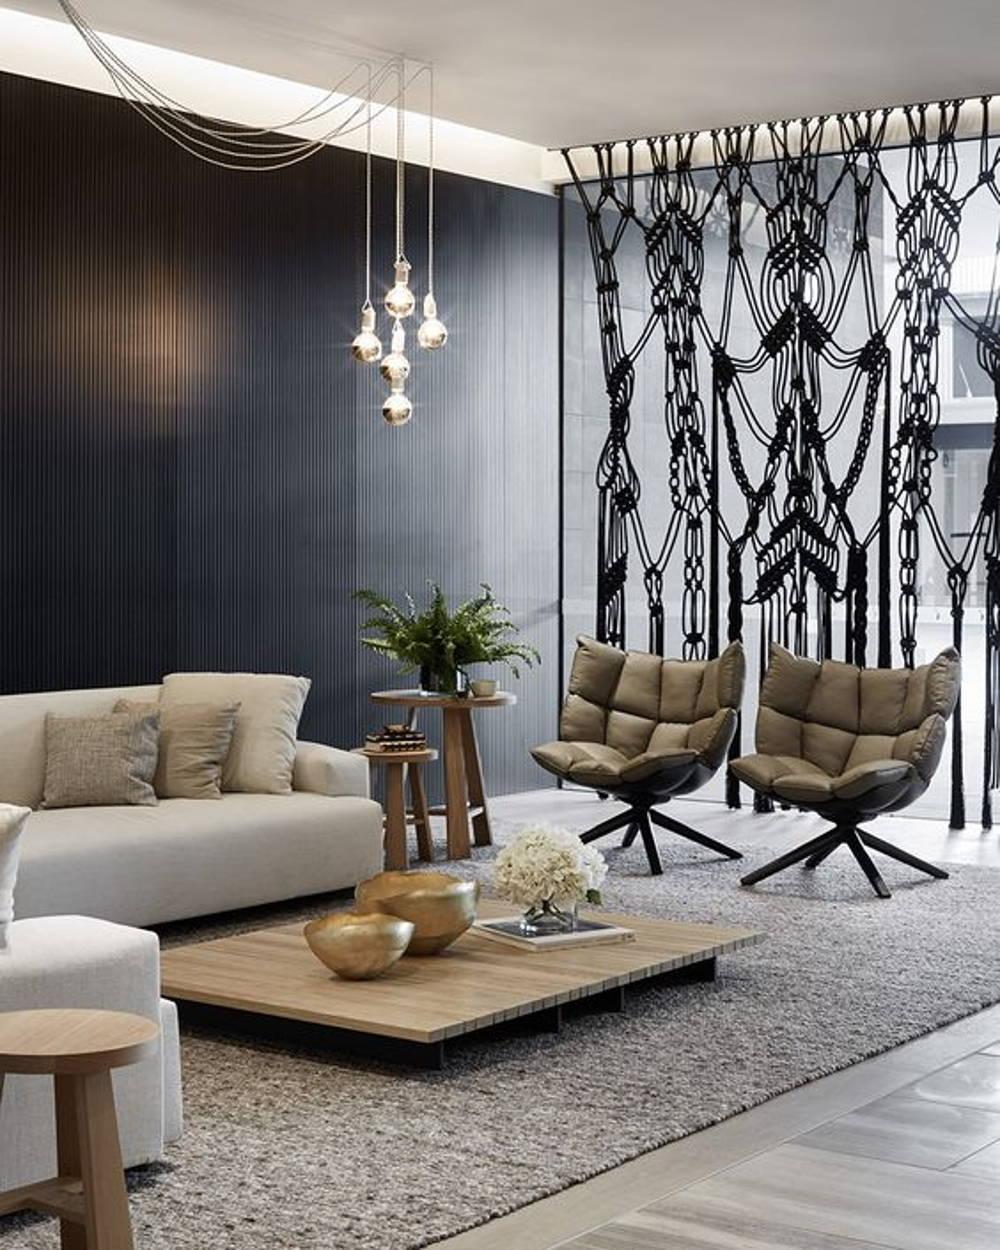 Curtain divider living room